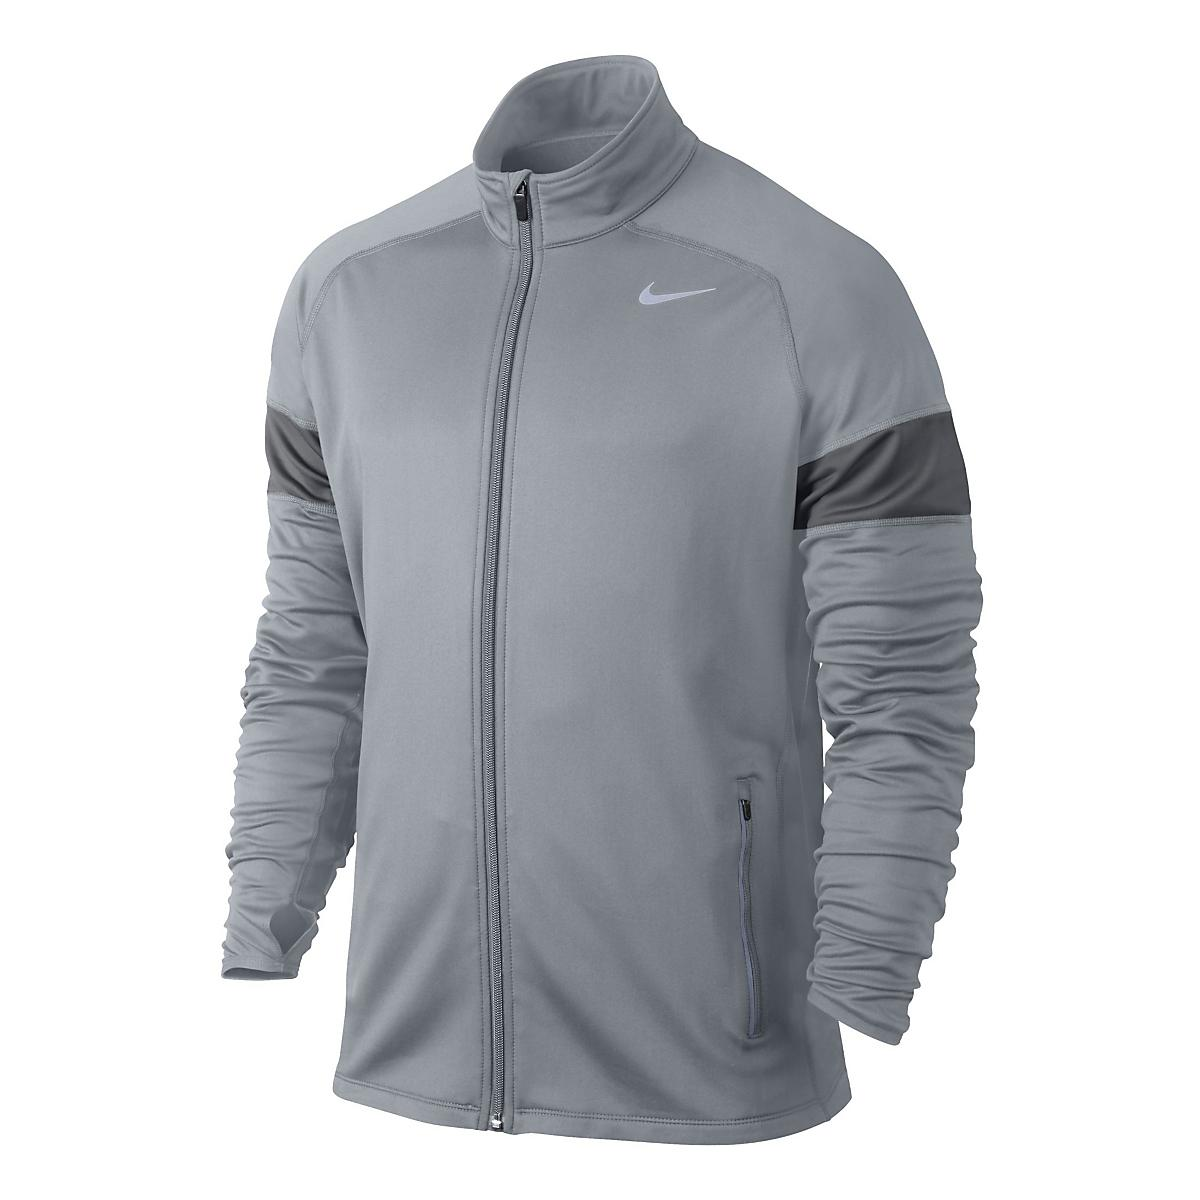 Nike element jacket men's - Mens Nike Element Thermal Full Zip Running Jackets At Road Runner Sports